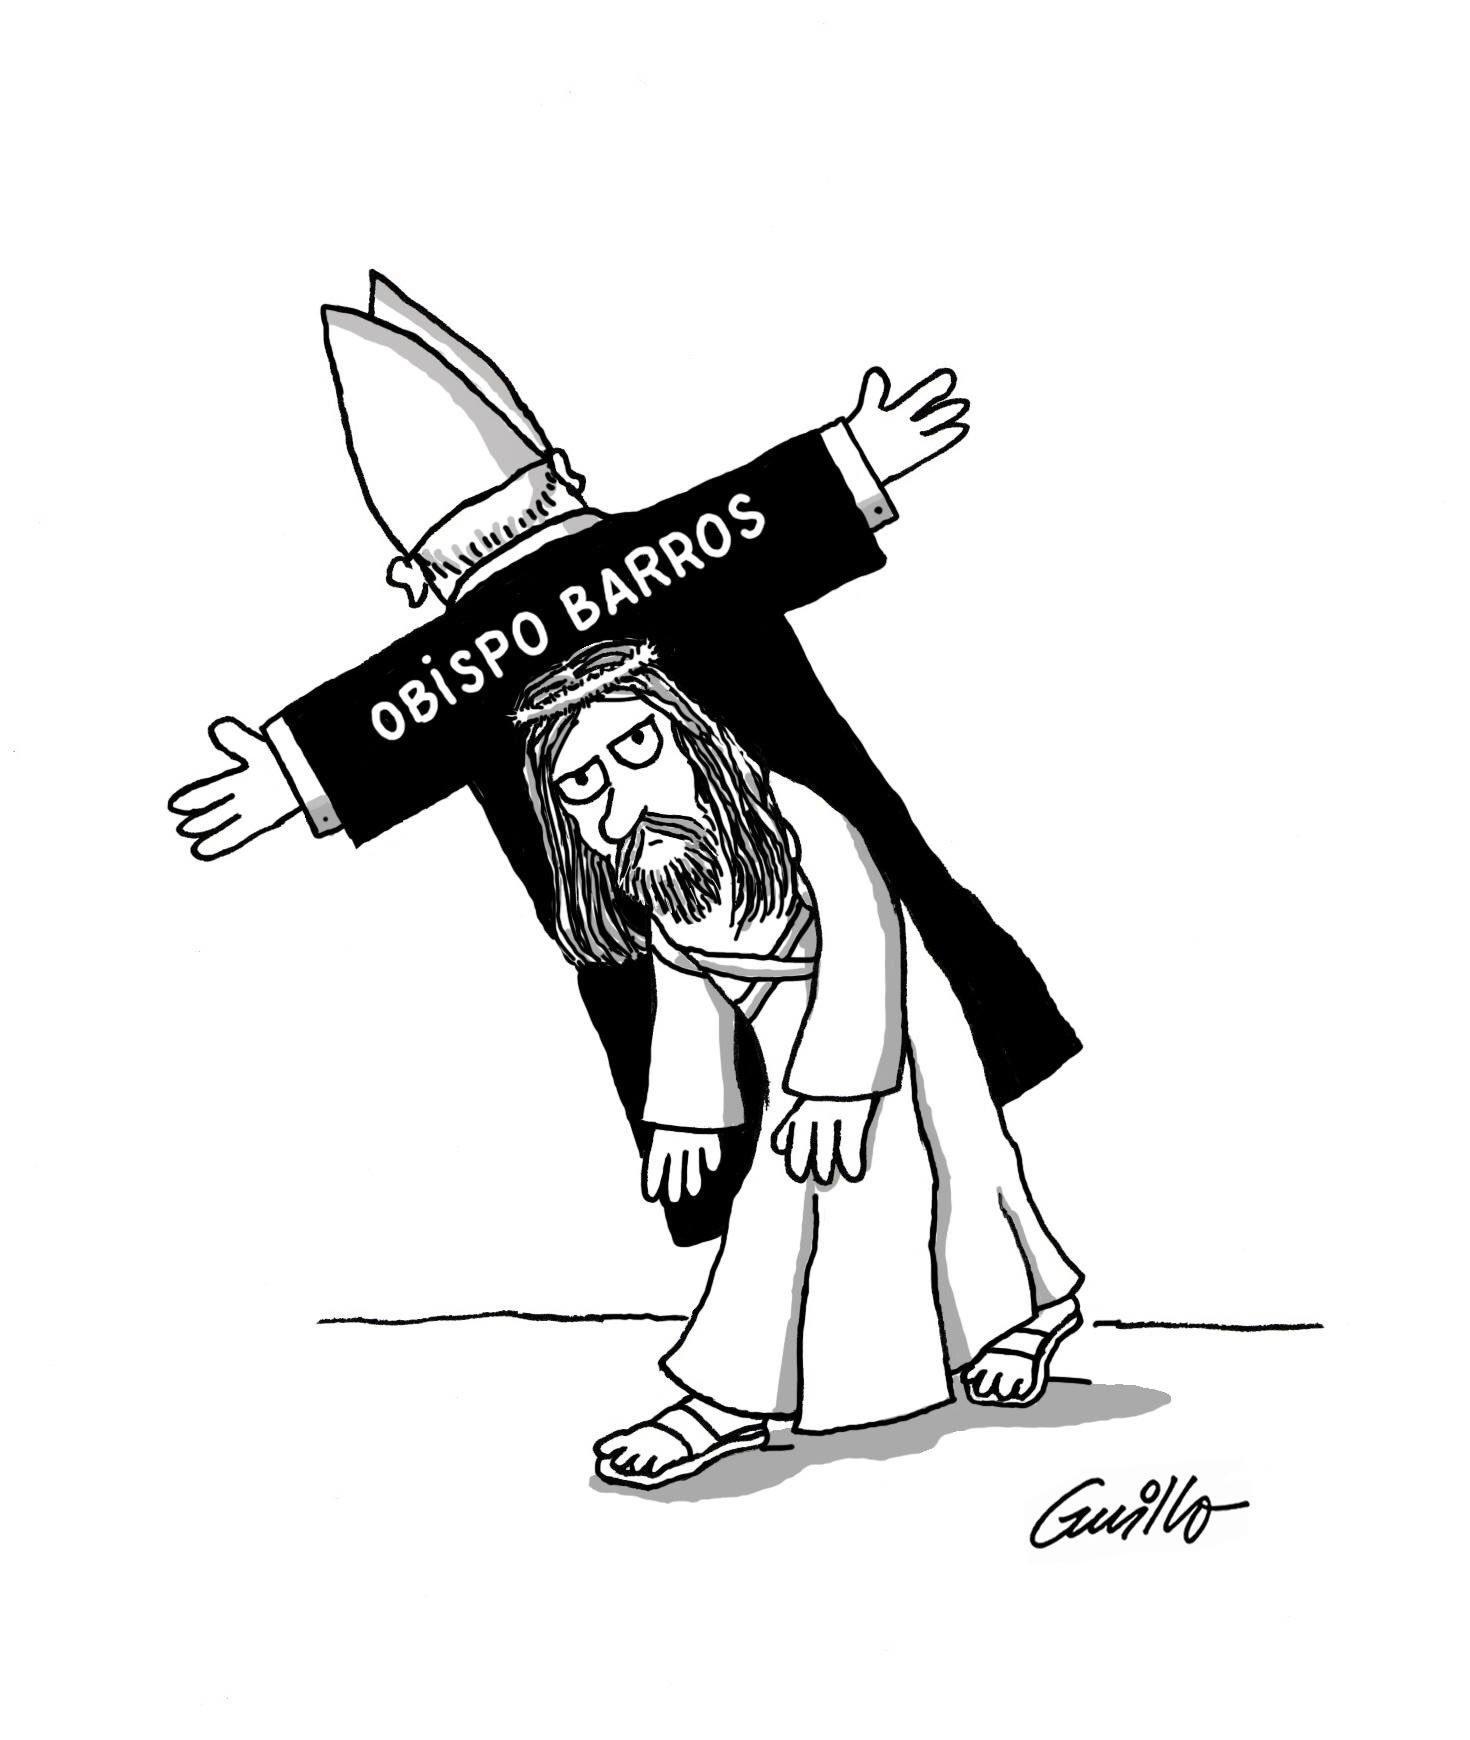 Obispo de Pederastas